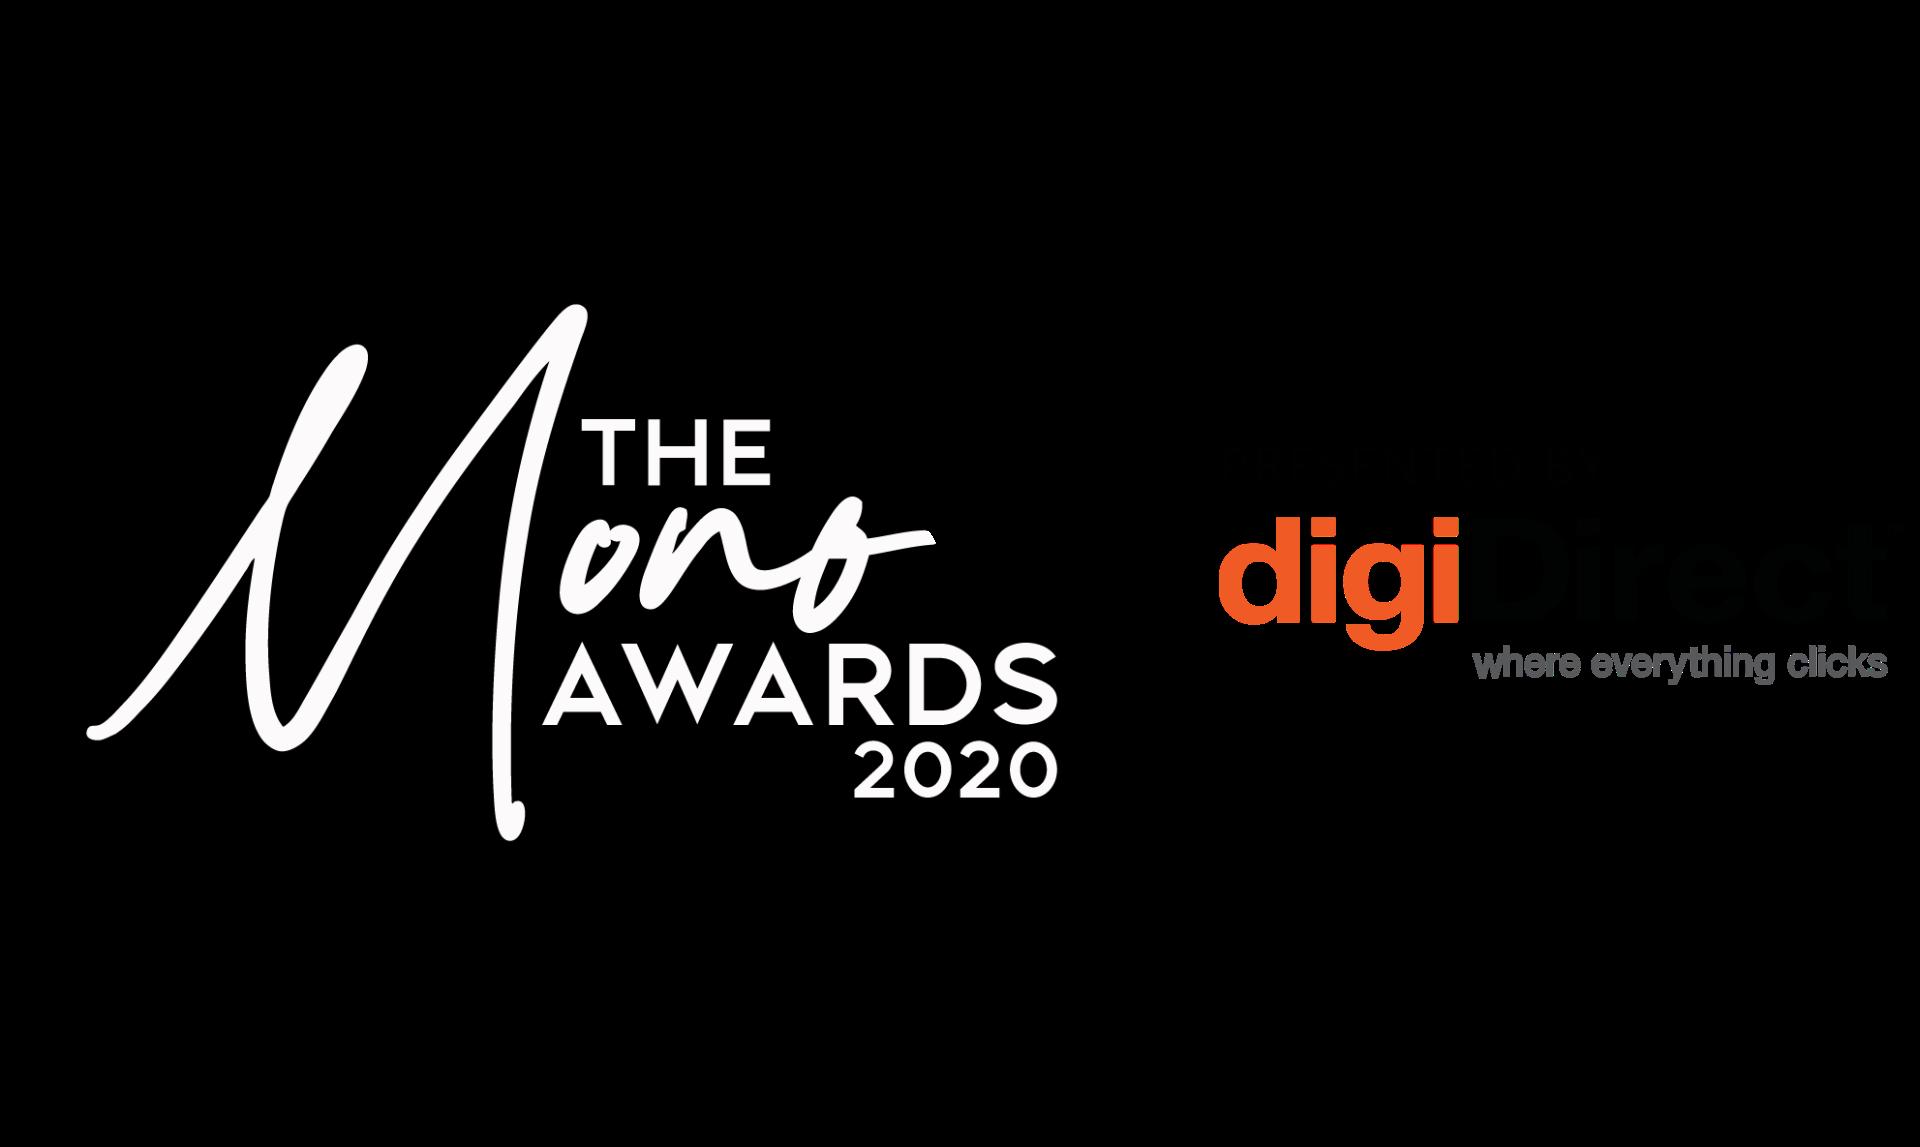 Mono Awards logo